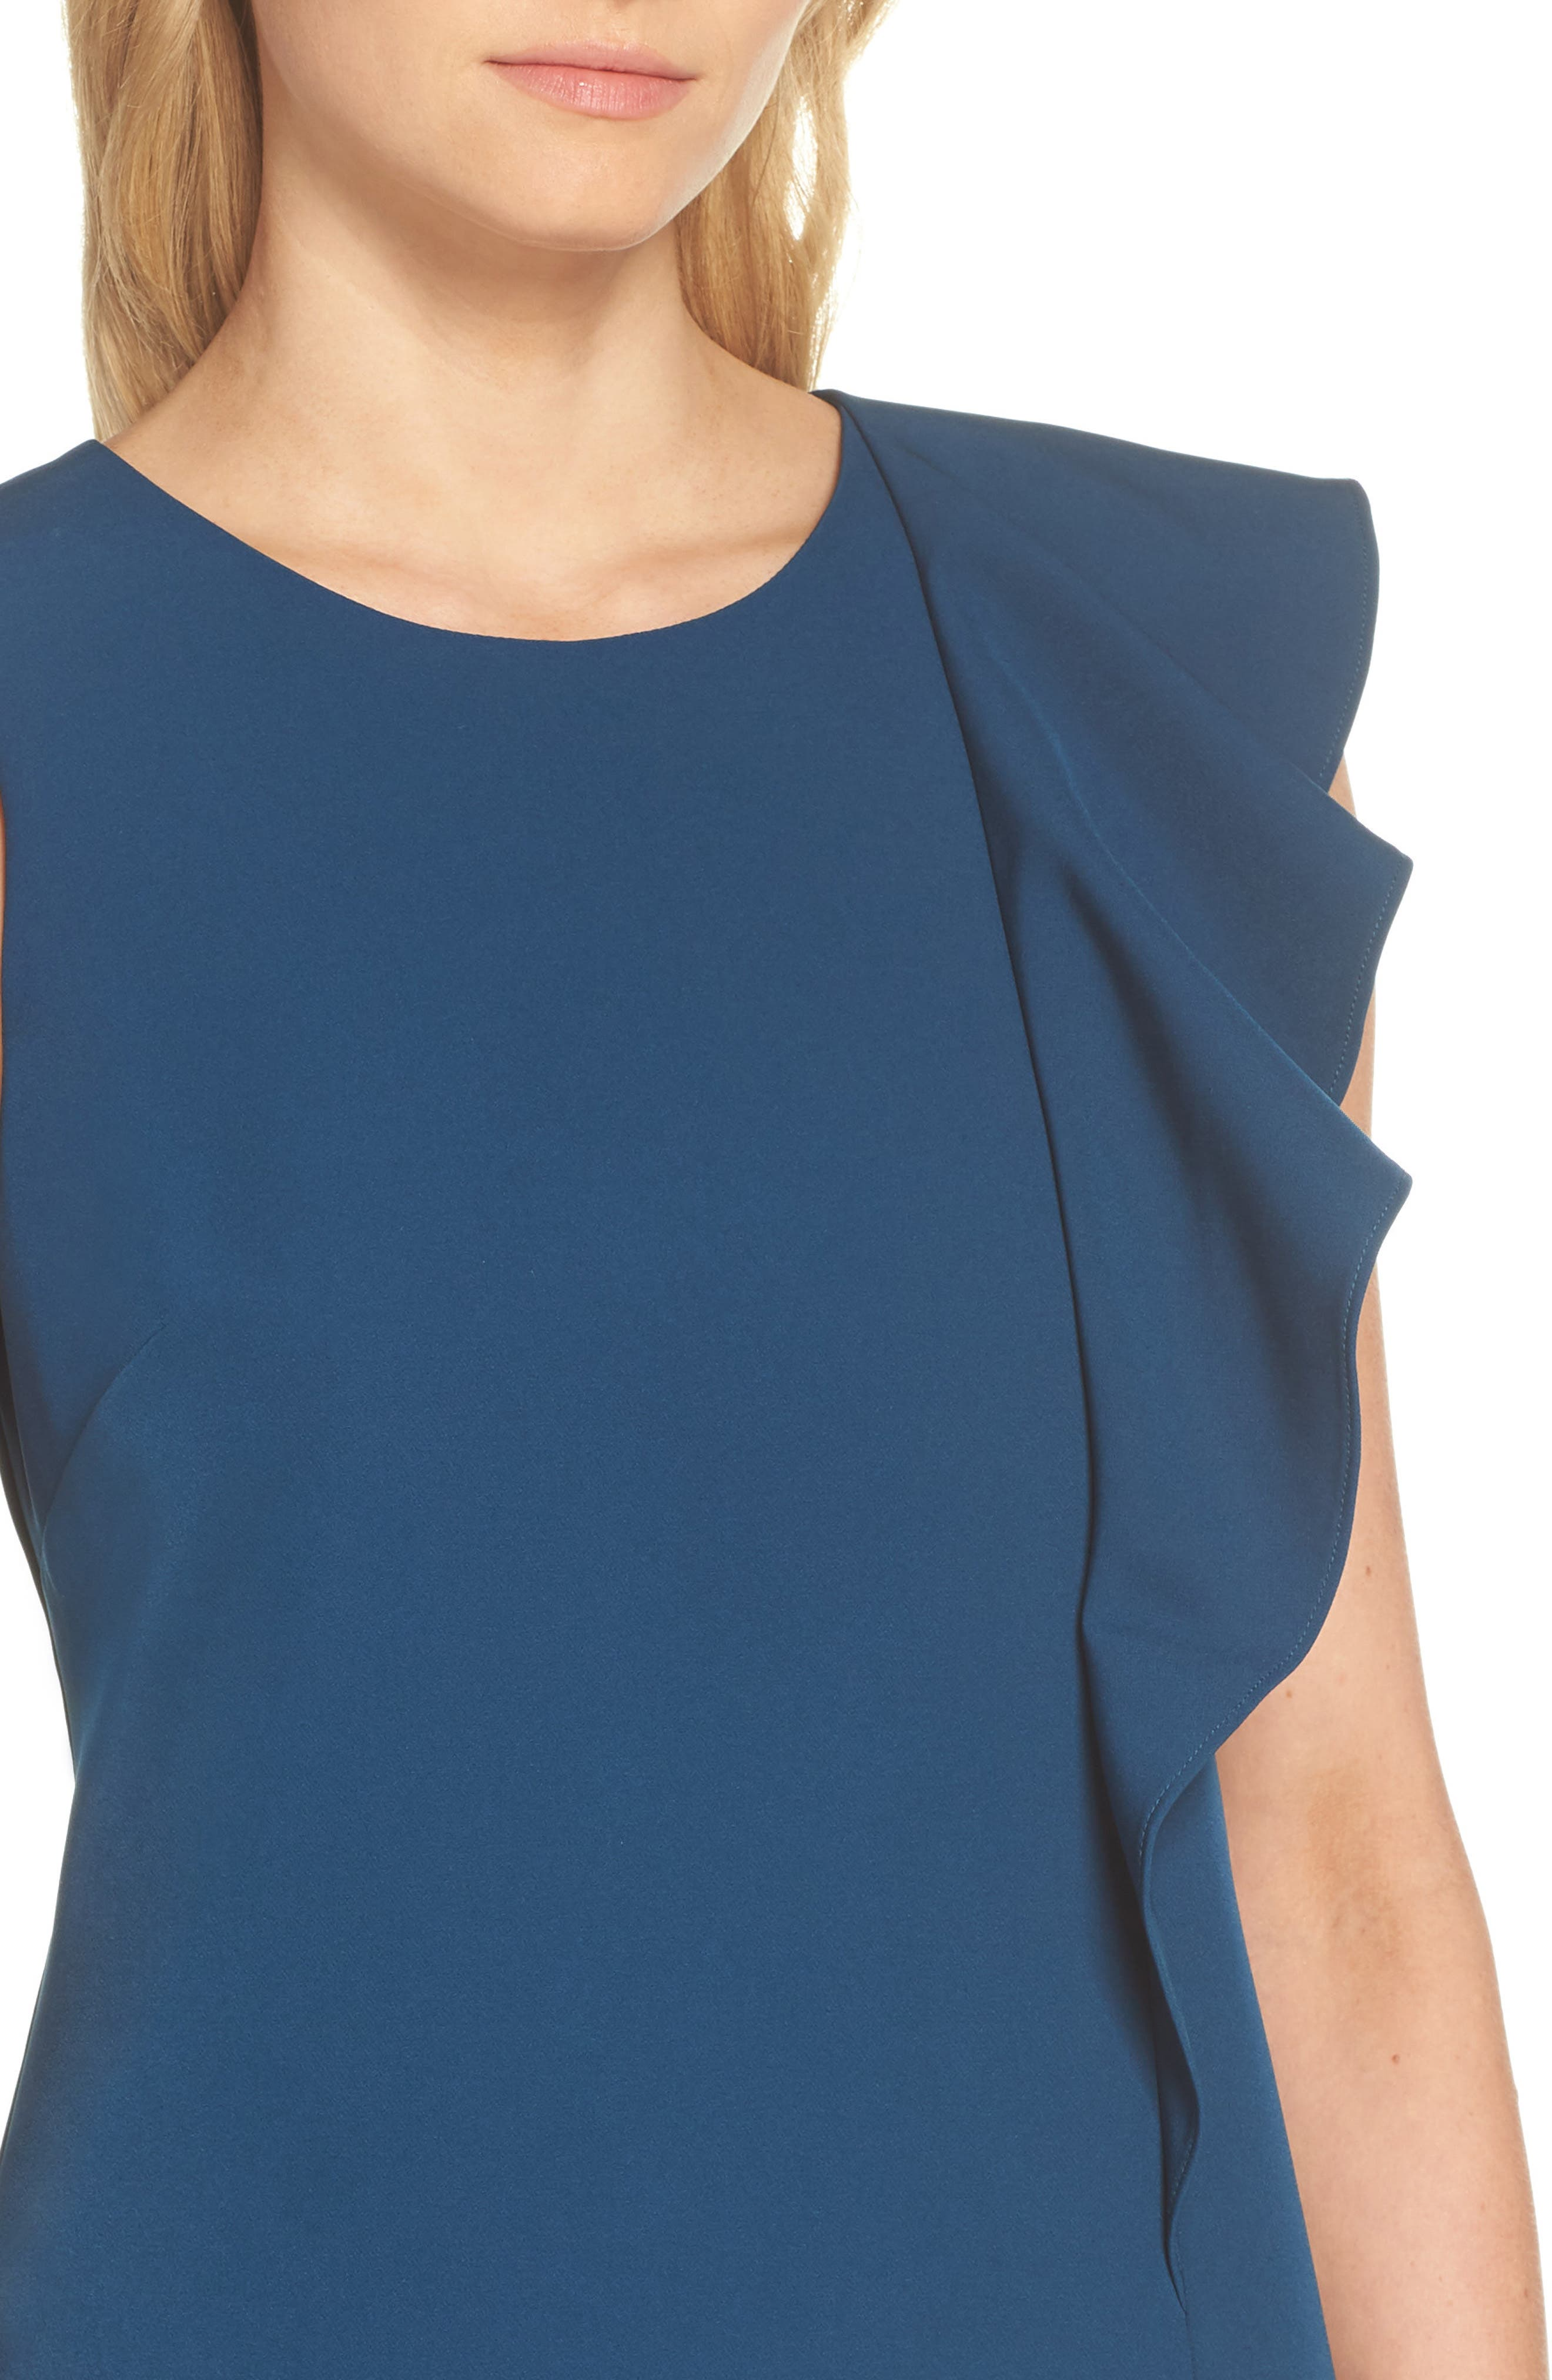 Ruffle Crepe A-Line Dress,                             Alternate thumbnail 4, color,                             Deep Teal